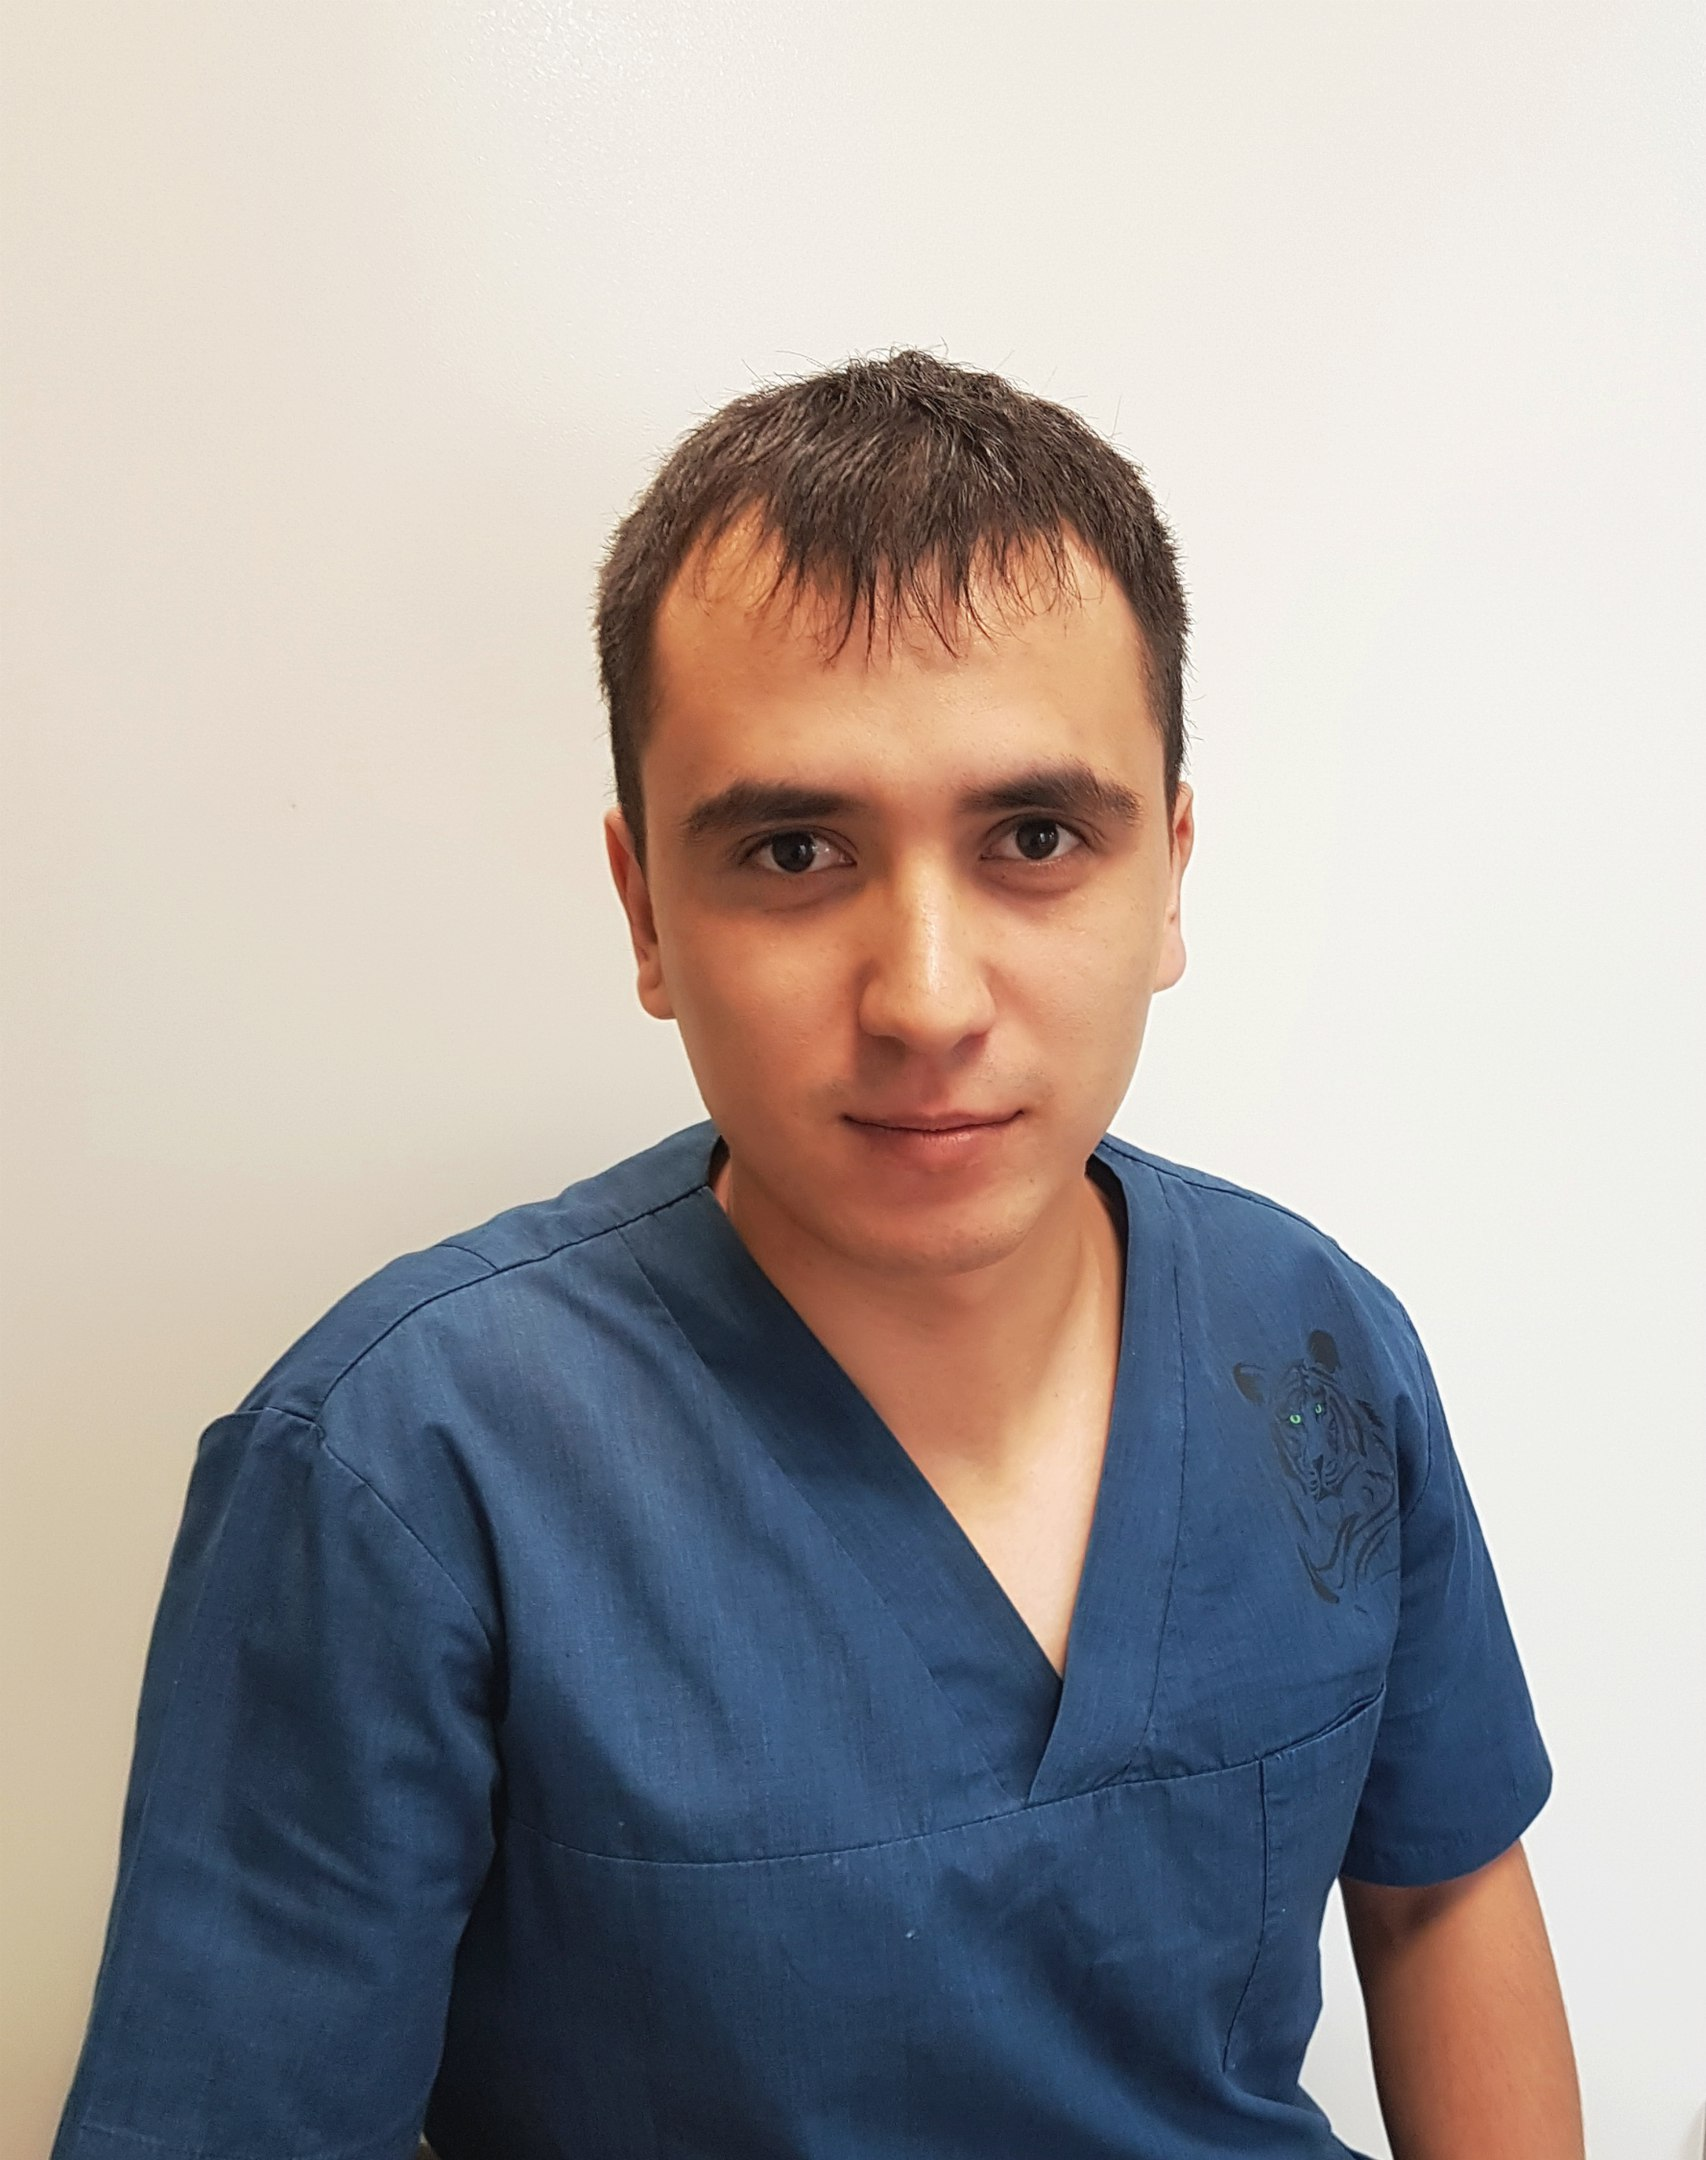 Тагиров Айдар Фарукович